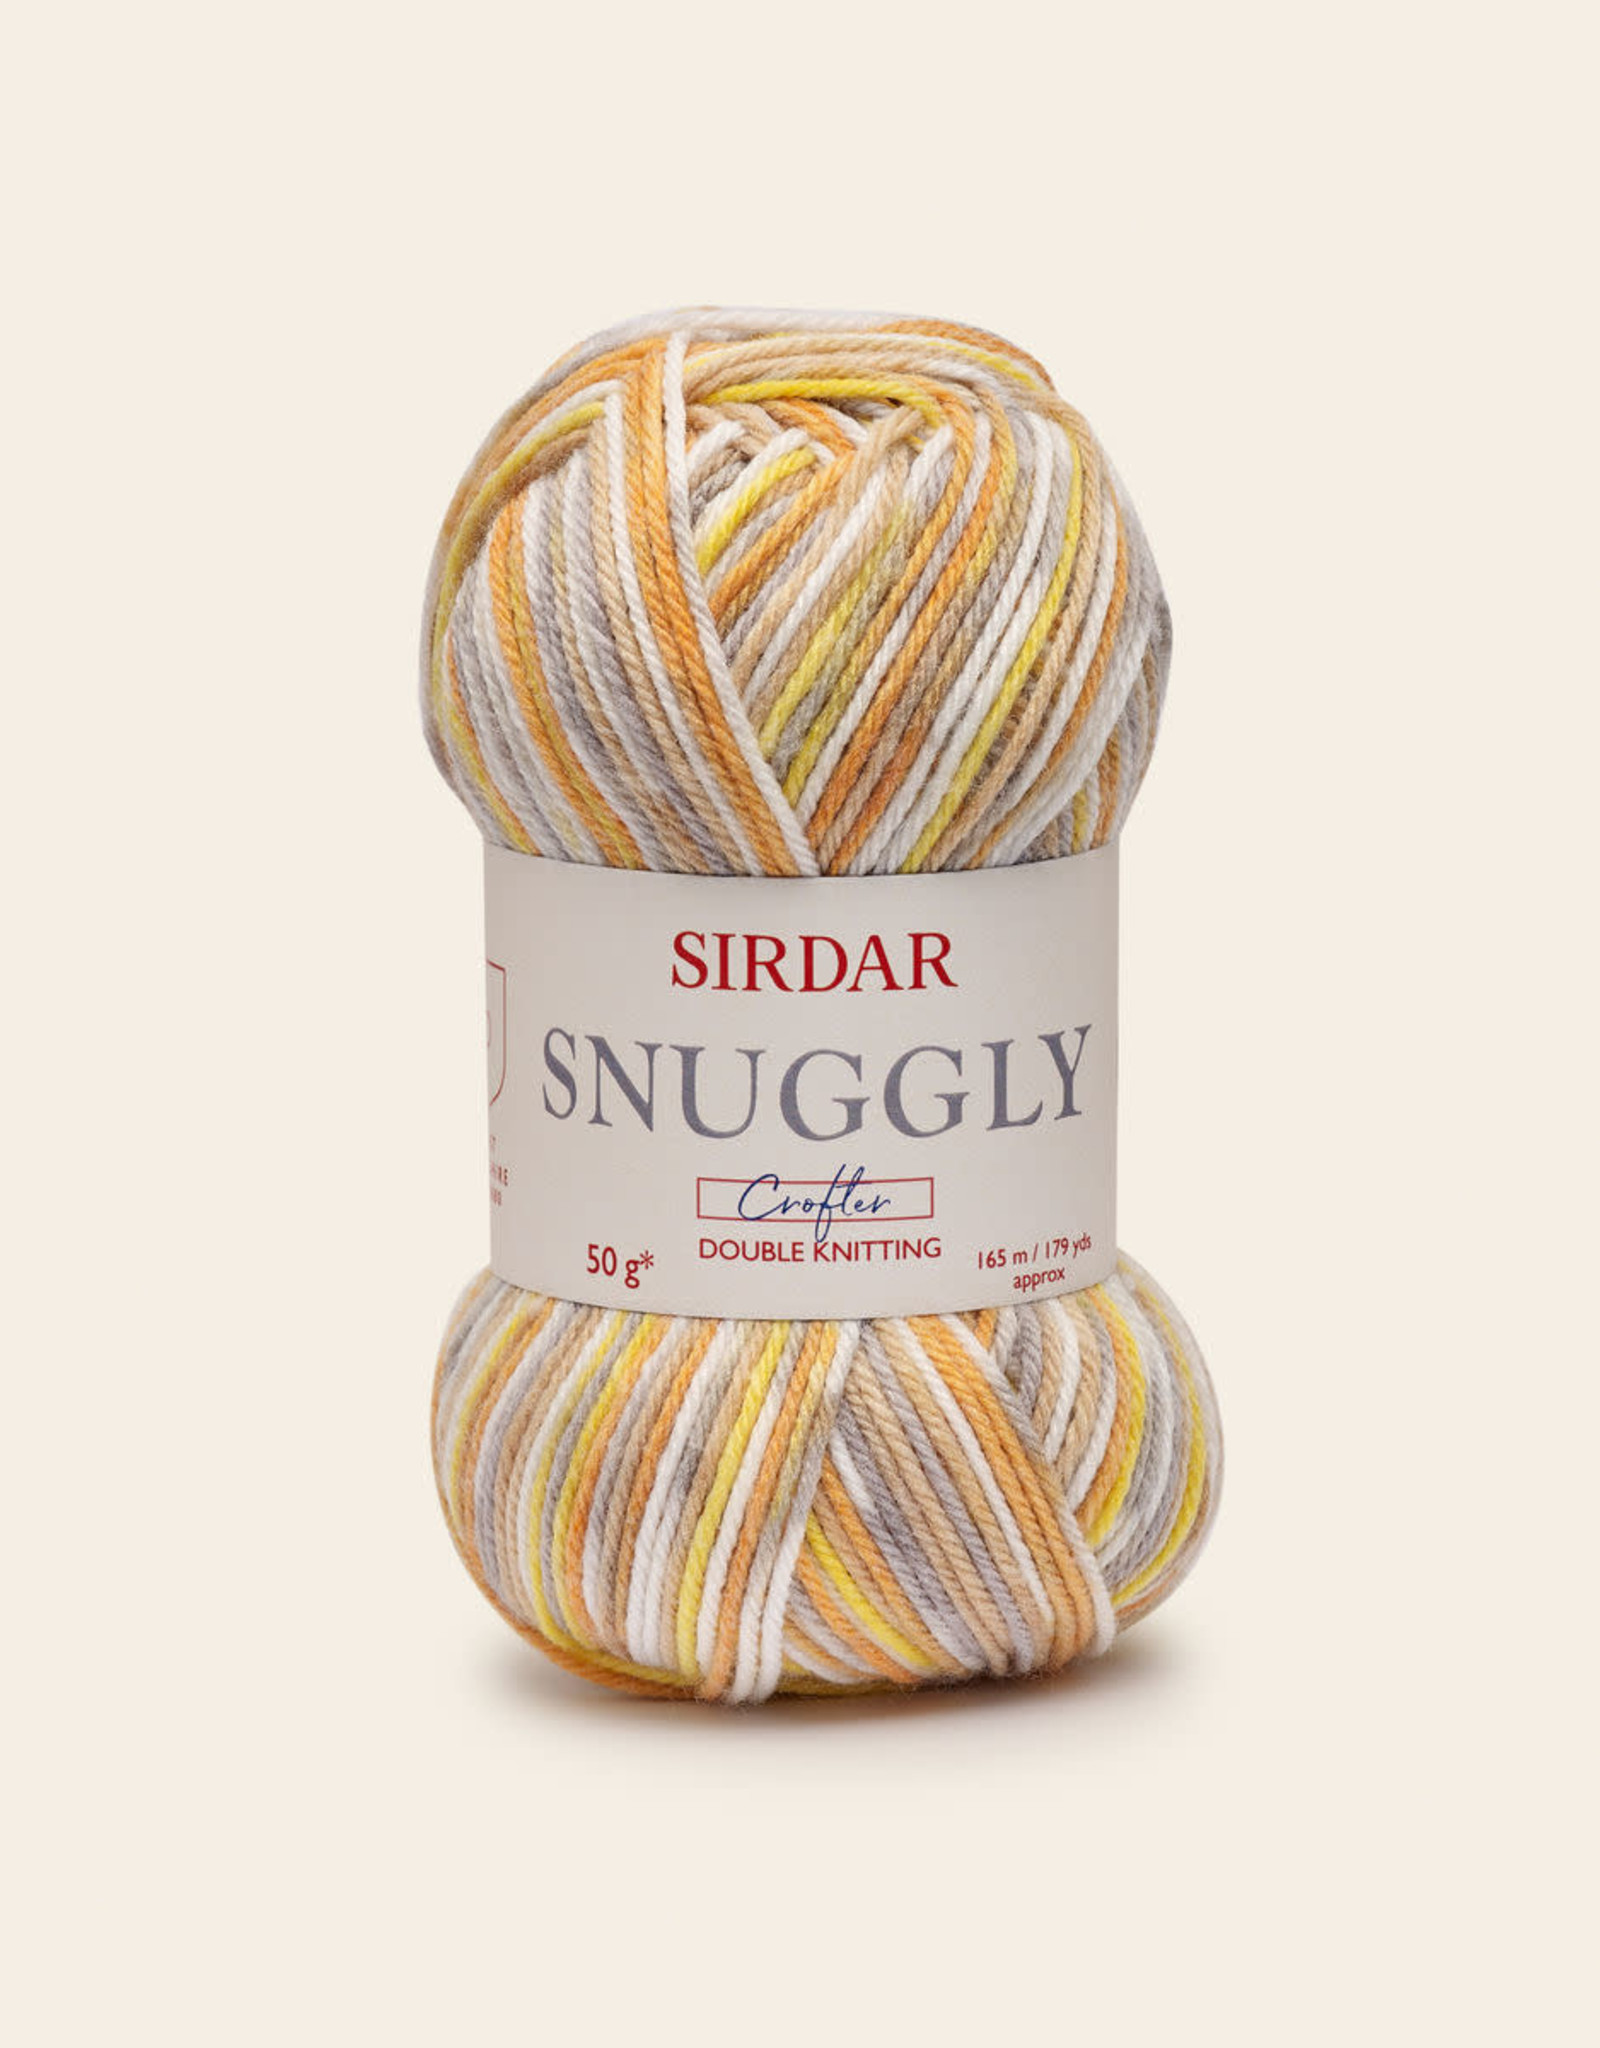 Sirdar &  Snuggly Crofter DK ~